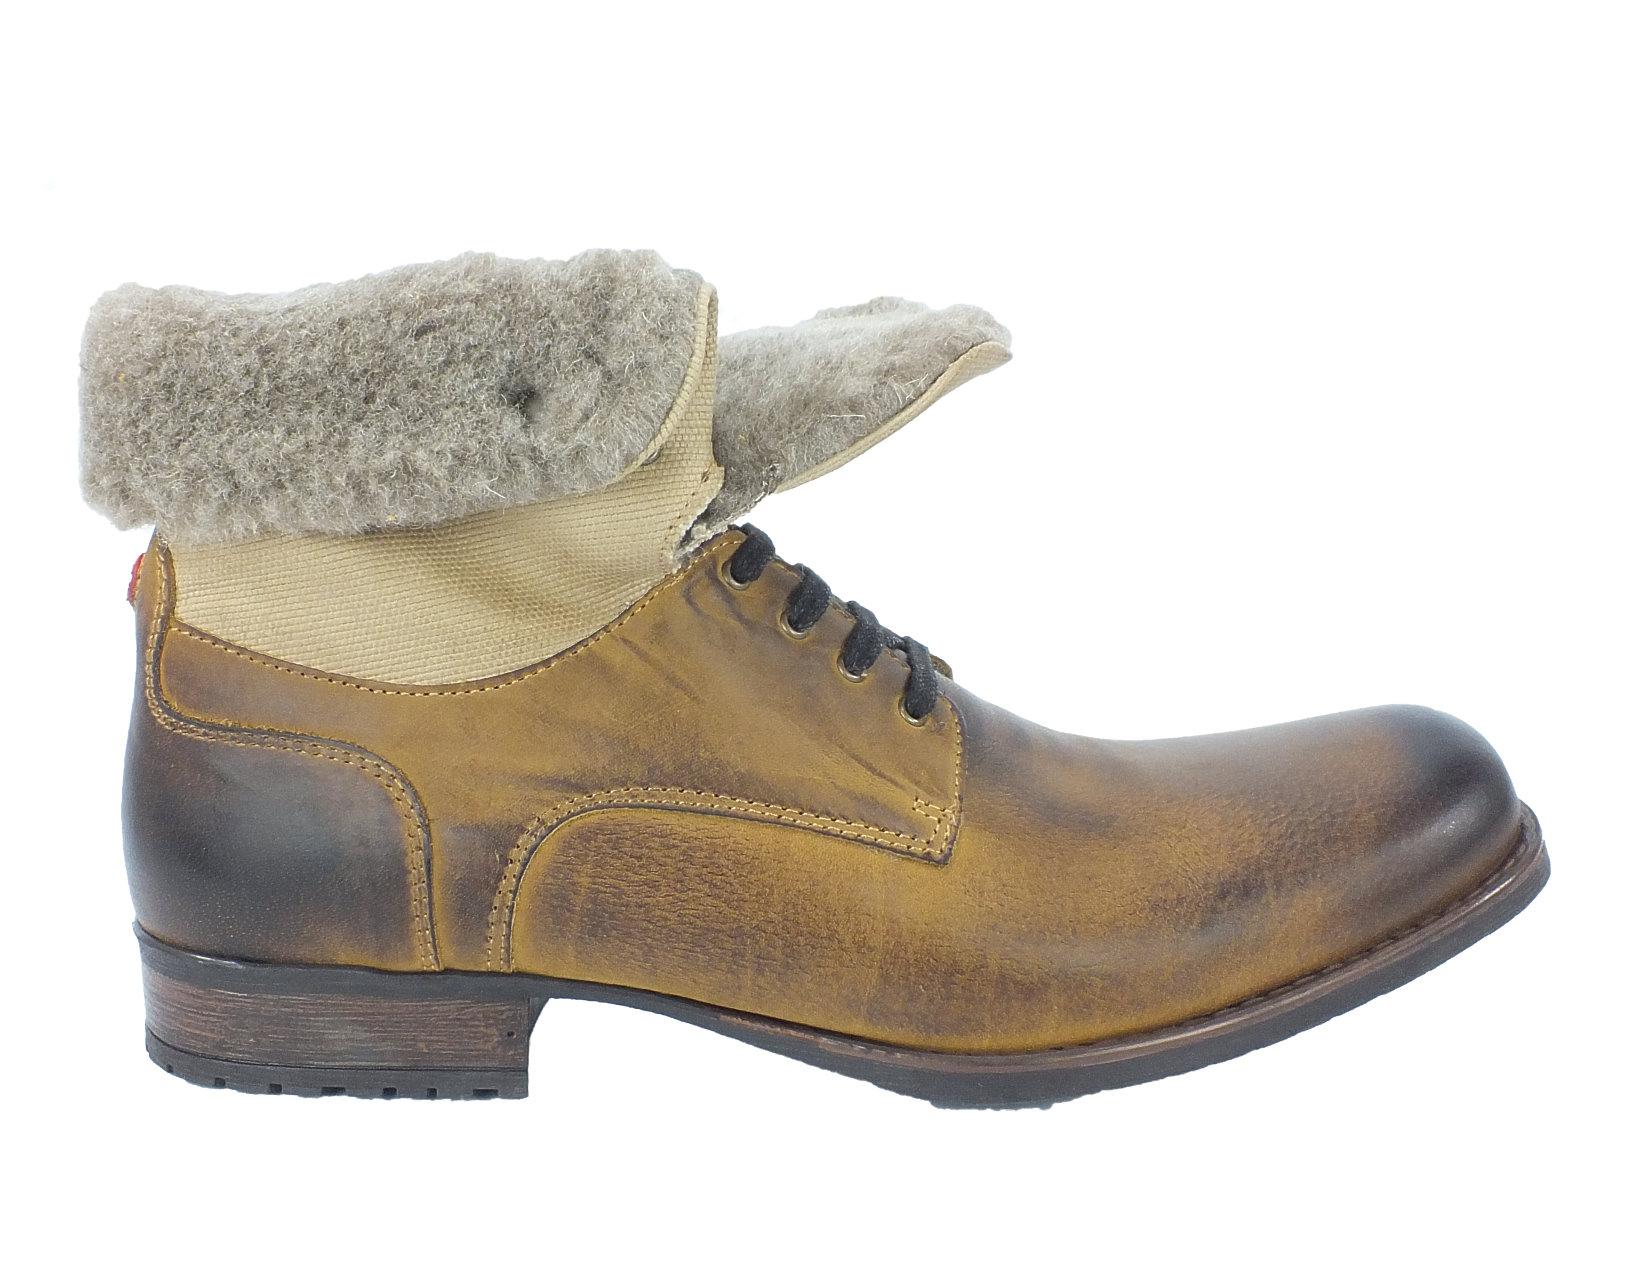 neu nobrand herren leder combat boots panama oil braun 6309 ebay. Black Bedroom Furniture Sets. Home Design Ideas